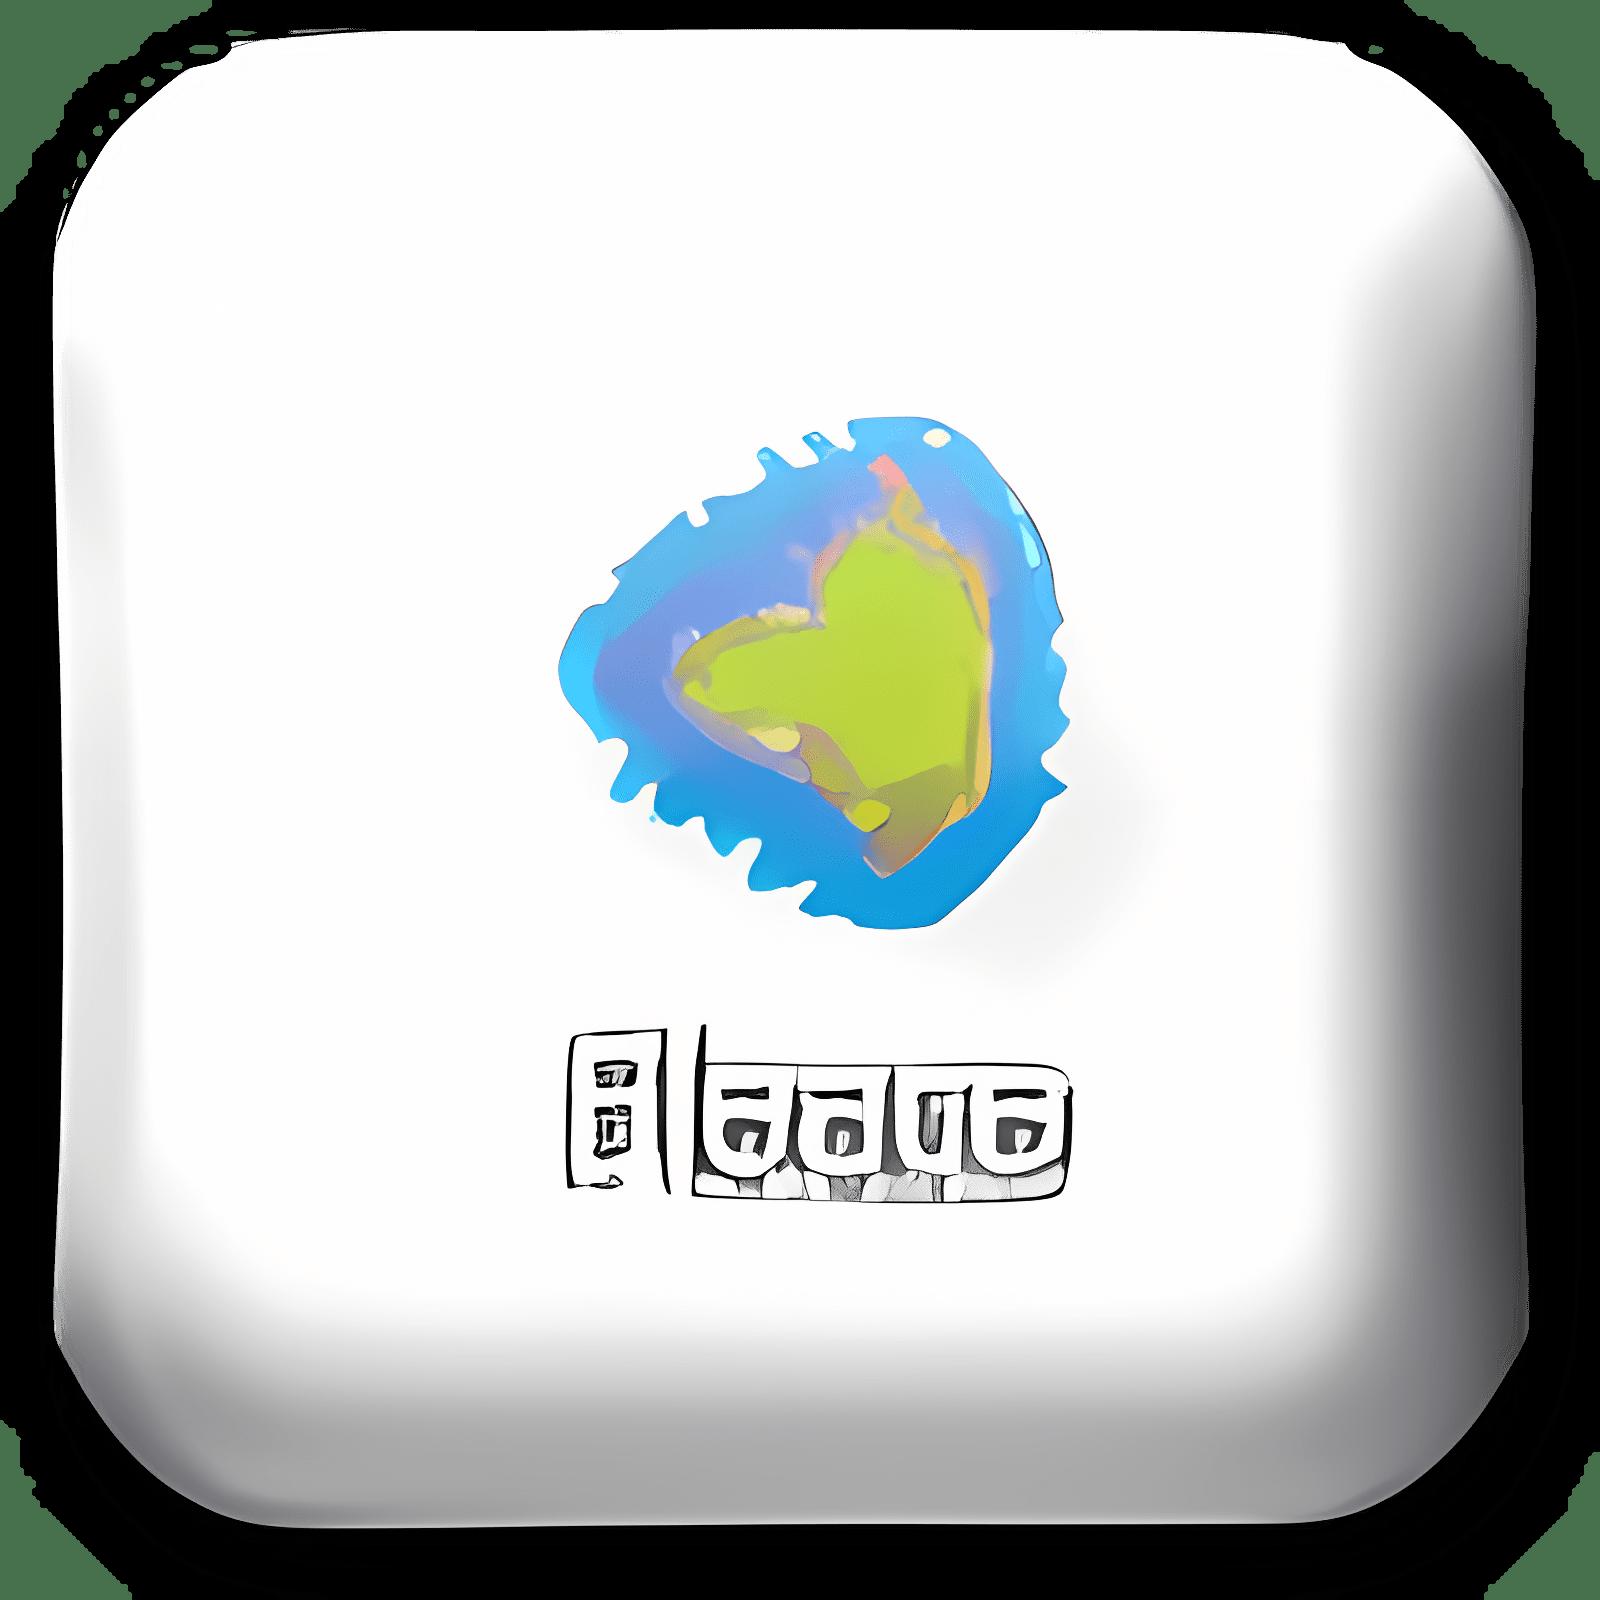 Fleace